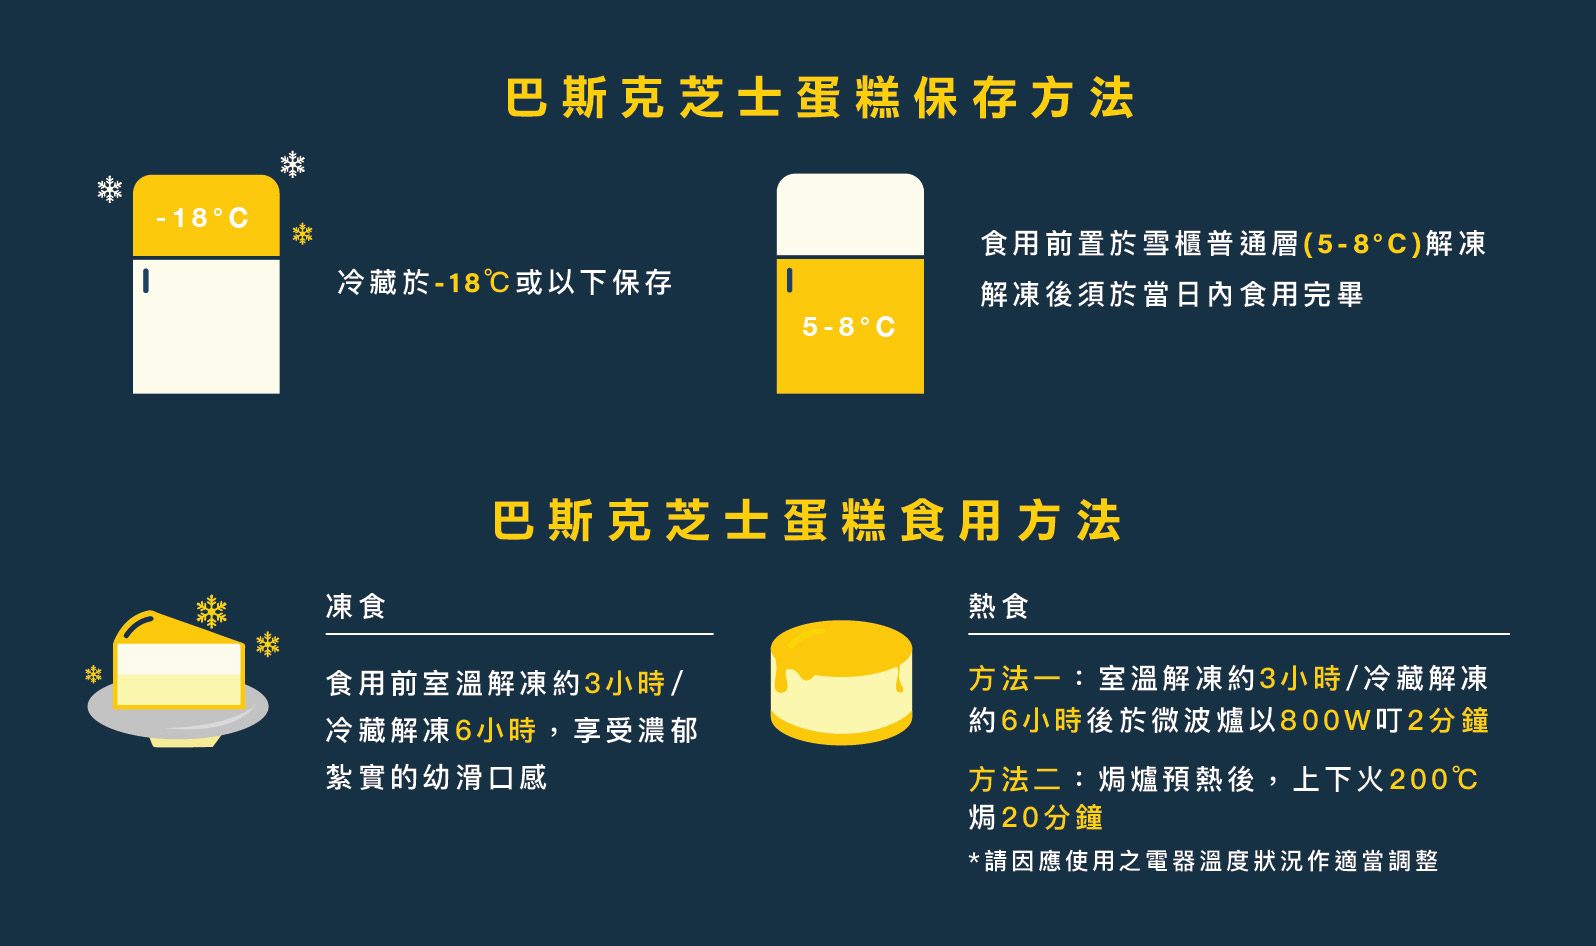 luna-basquecake-eating-method-website-20210126-aw-03.jpg